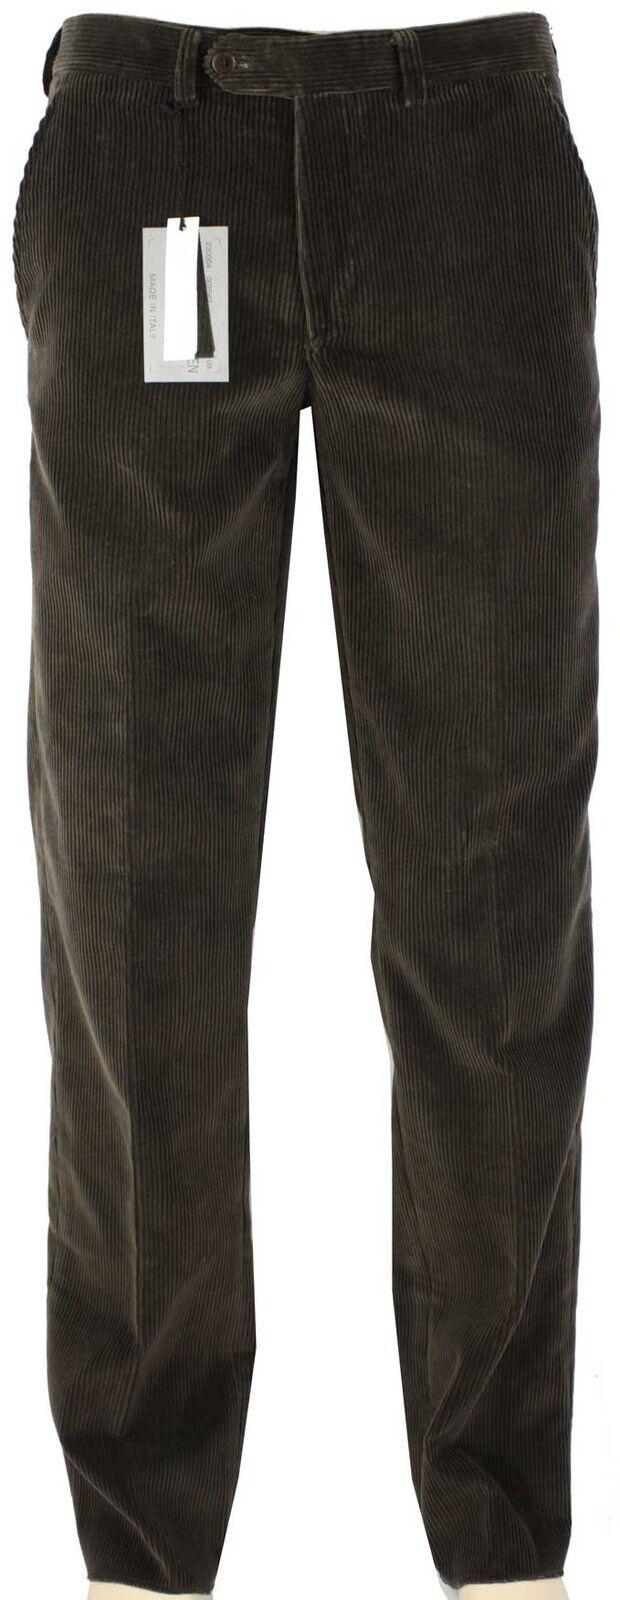 NEWT100%AUT ALEXANDER MCQUEEN BROWN FLATFRONT CORDUROYS PANTS 58 IT 40